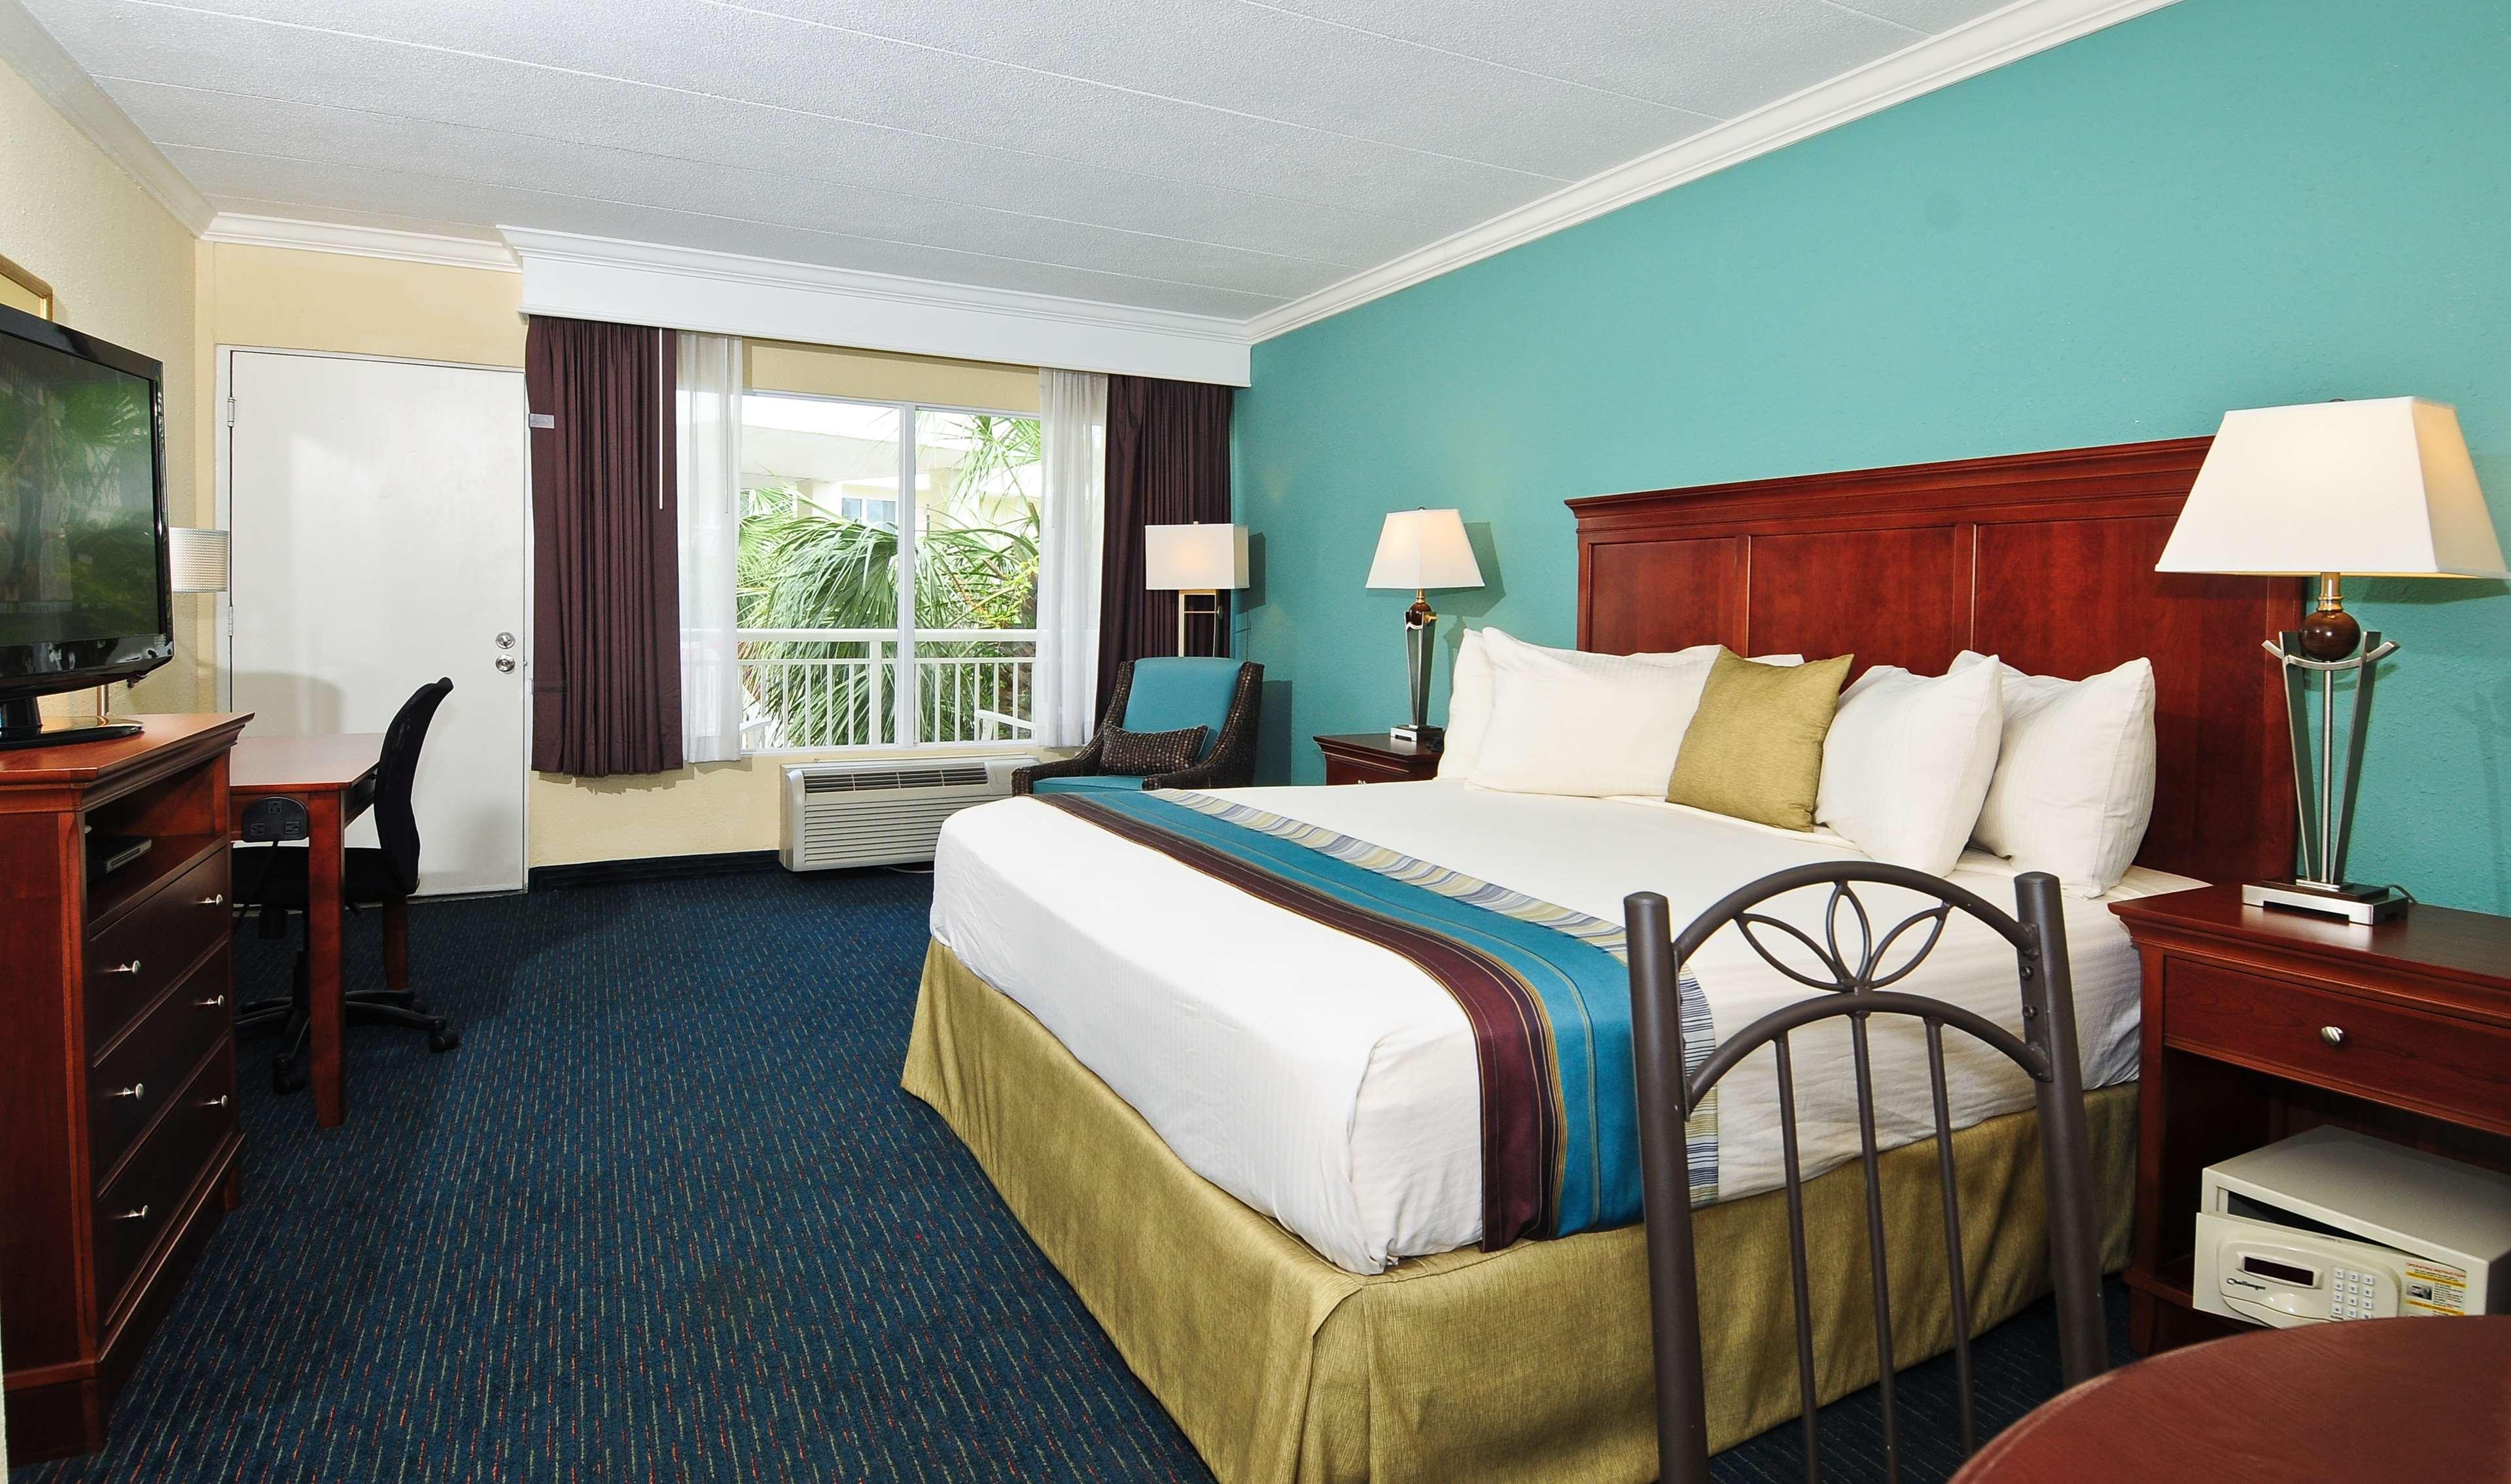 Best Western Plus Grand Strand Inn & Suites image 49